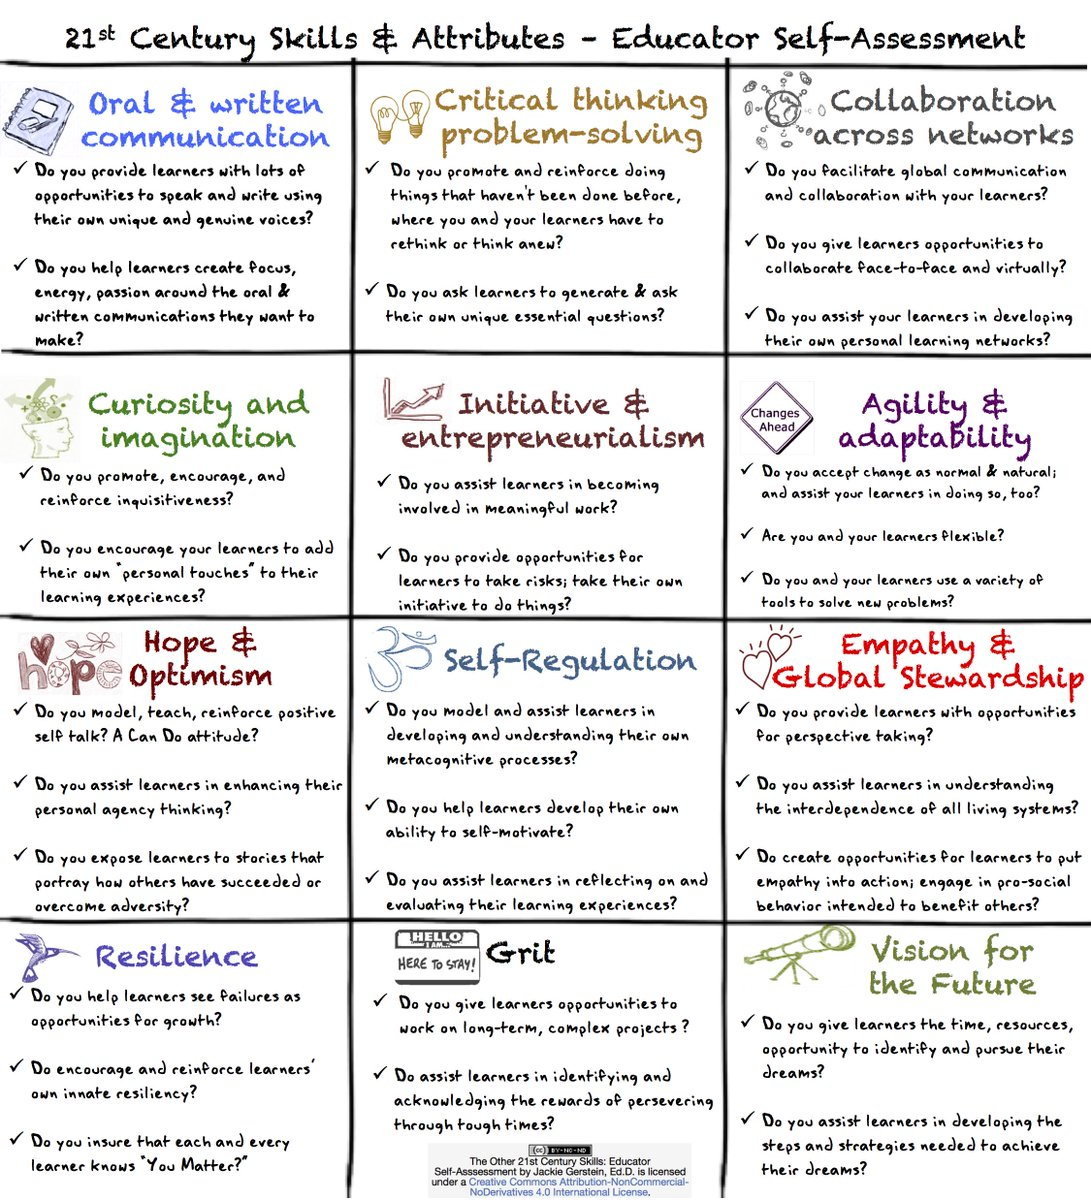 New: The Other 21st Century Skills: Educator Self-Assessment http://t.co/lI1f1nkUfi #edchat #sel http://t.co/0NtWSvfdtQ